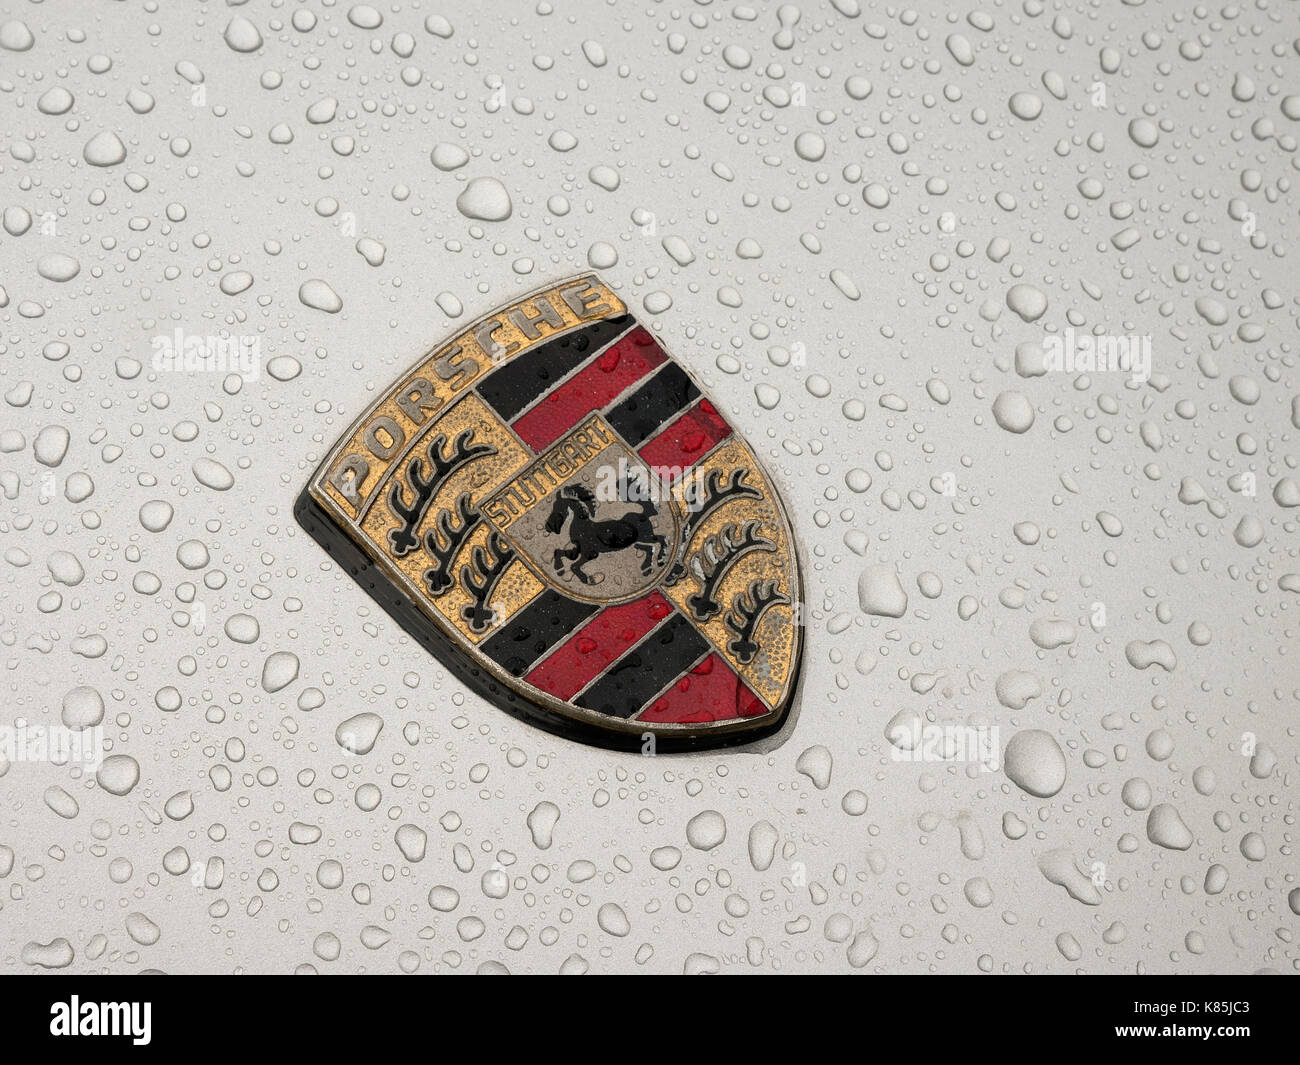 1x Silver Chrome S Emblem Porsche Badge Turbo S 911 918 Spyder 718 Cayman Boxter